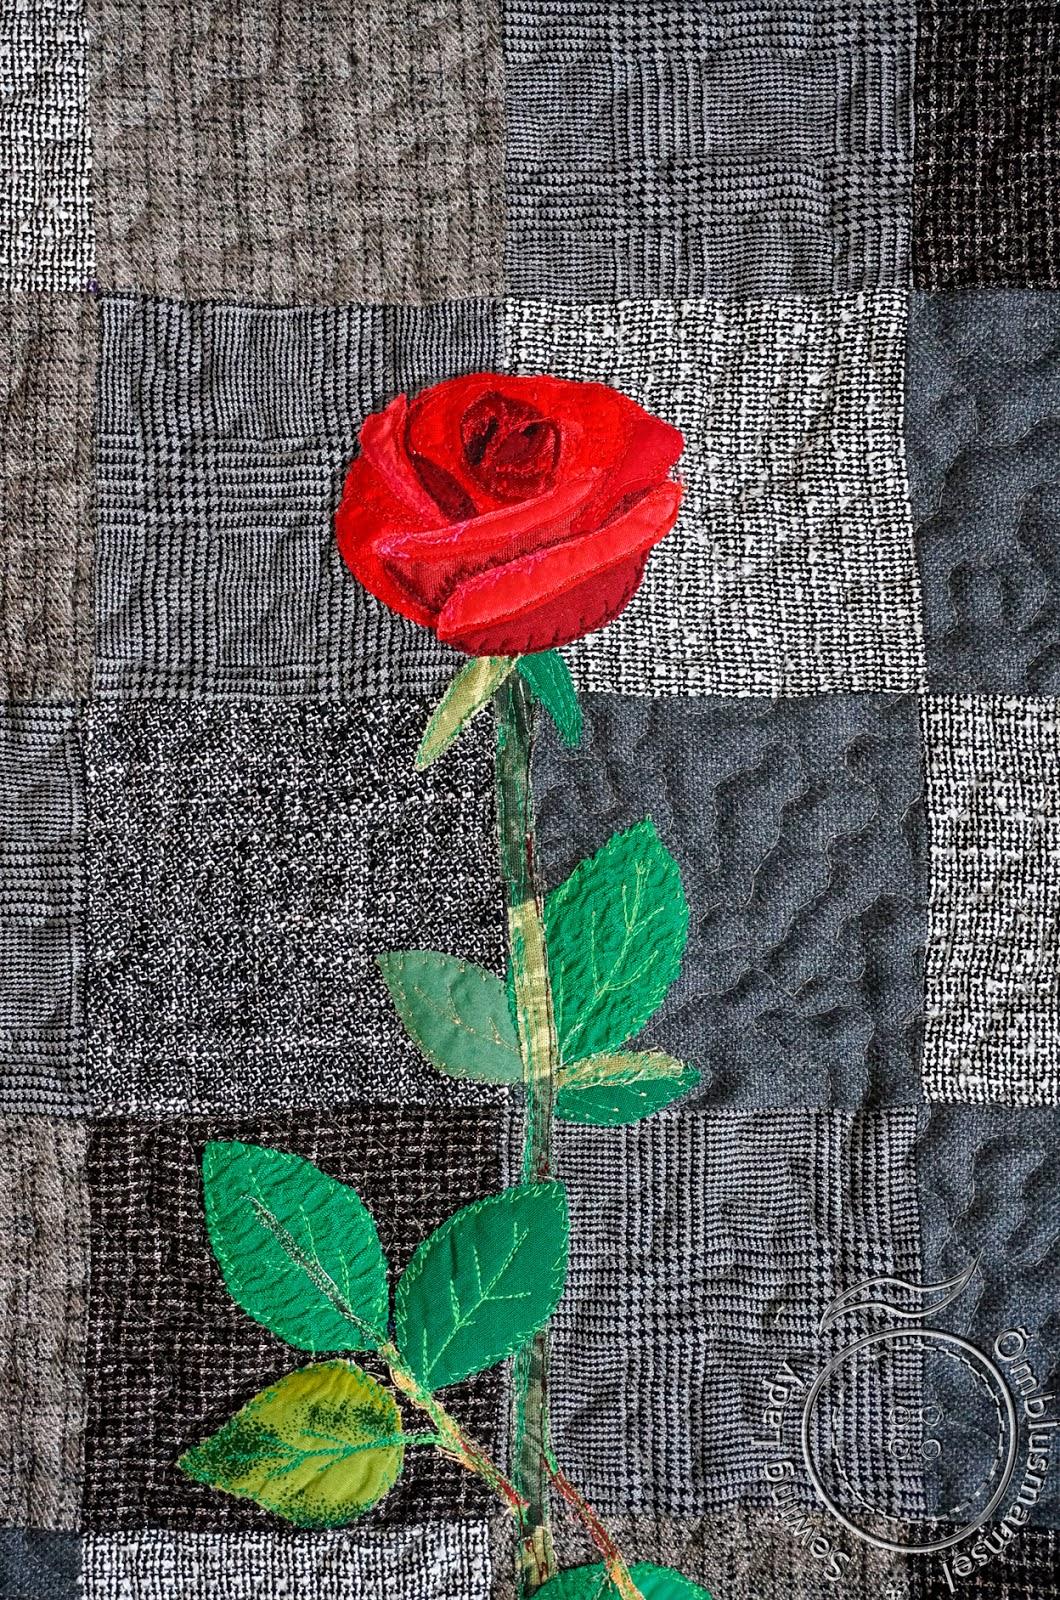 art quilting rose, appliqued flower